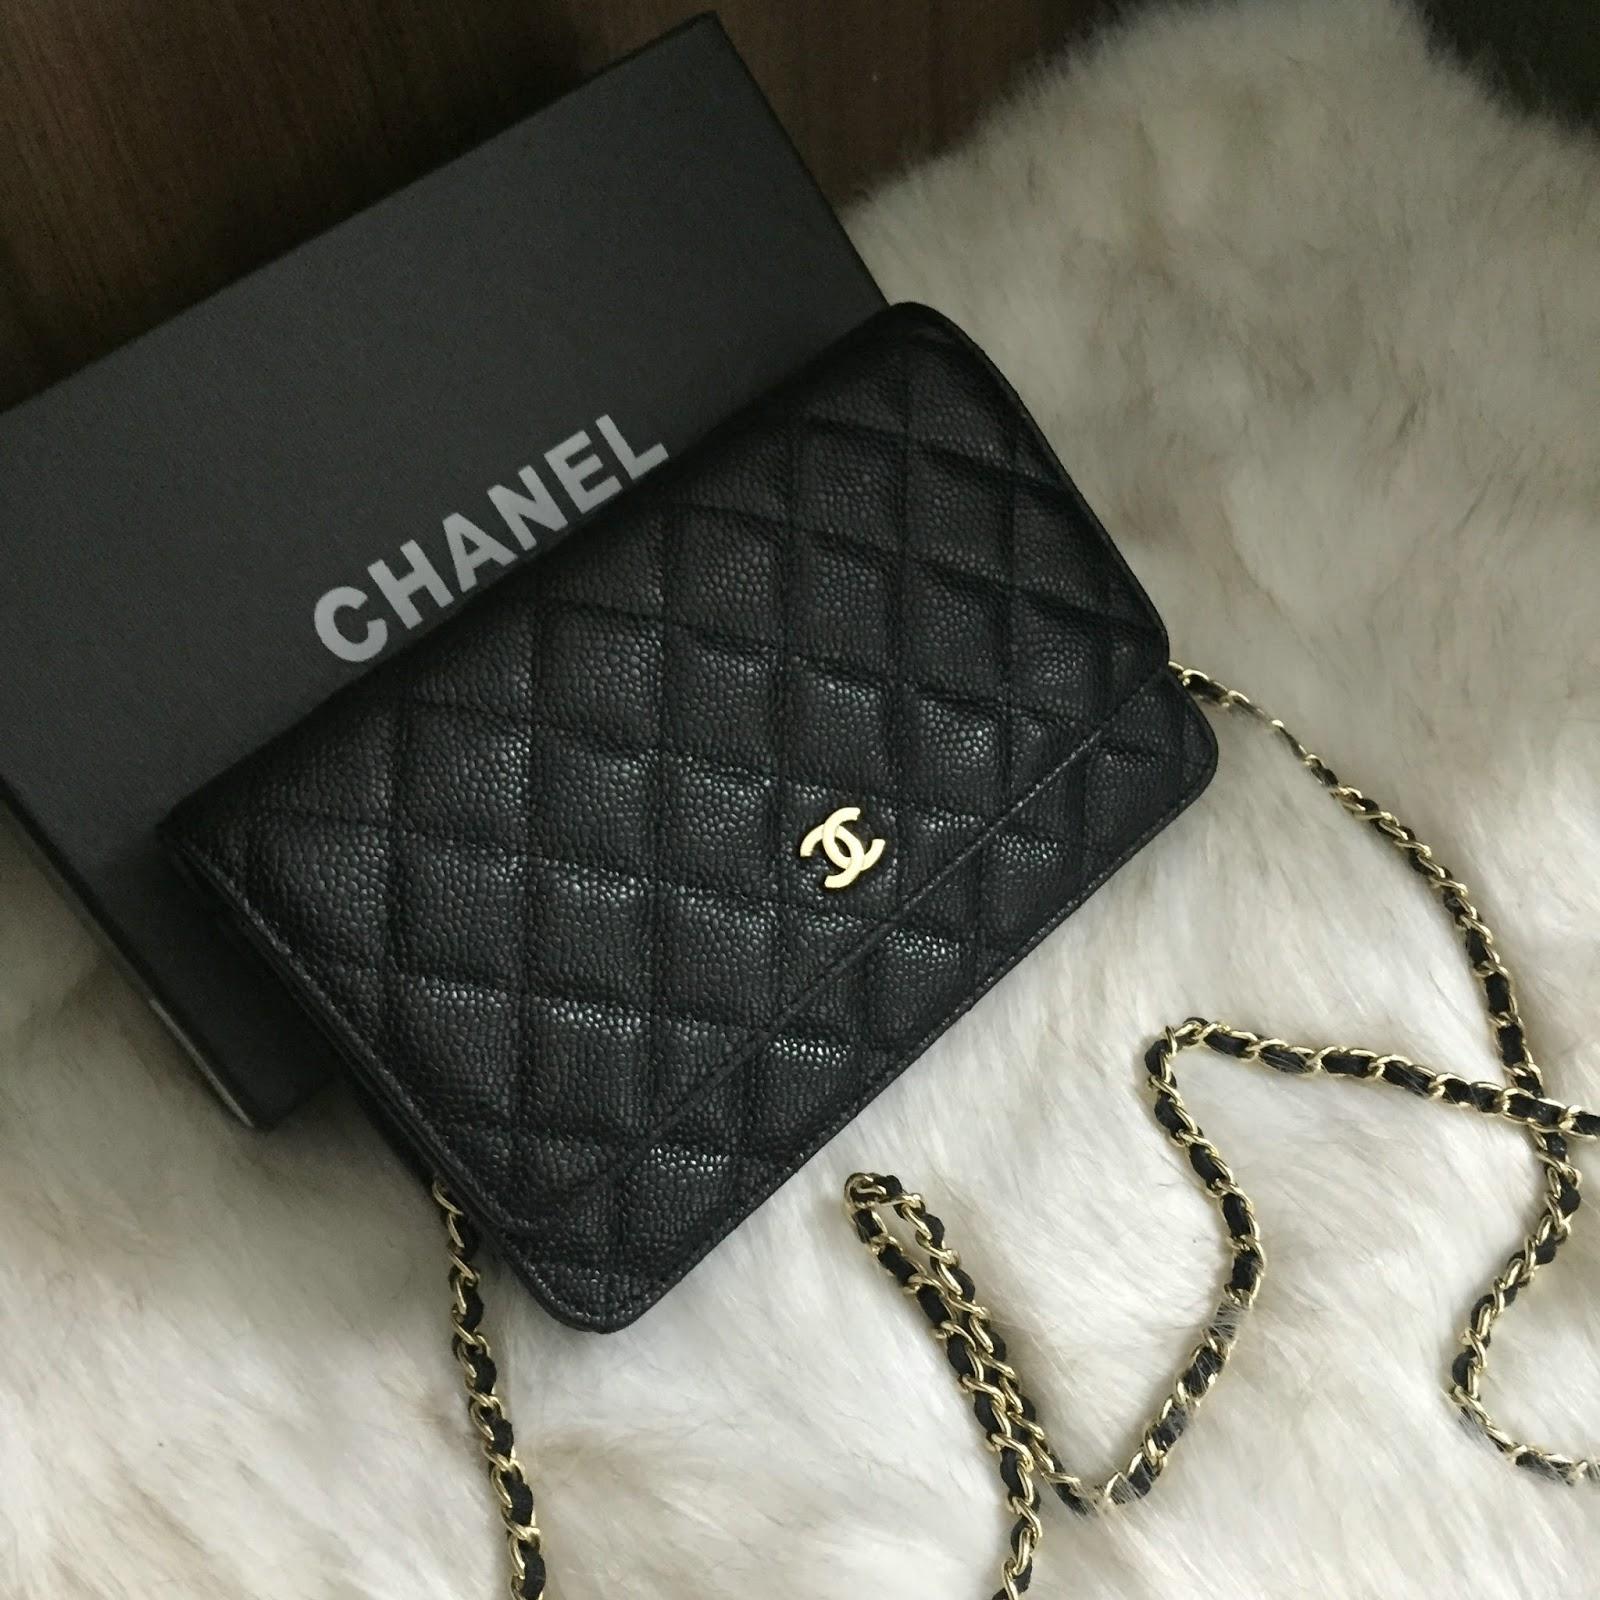 df9d4492cd77df Pre shipment photos of Chanel WOC 20cm in caviar leather best original  quality